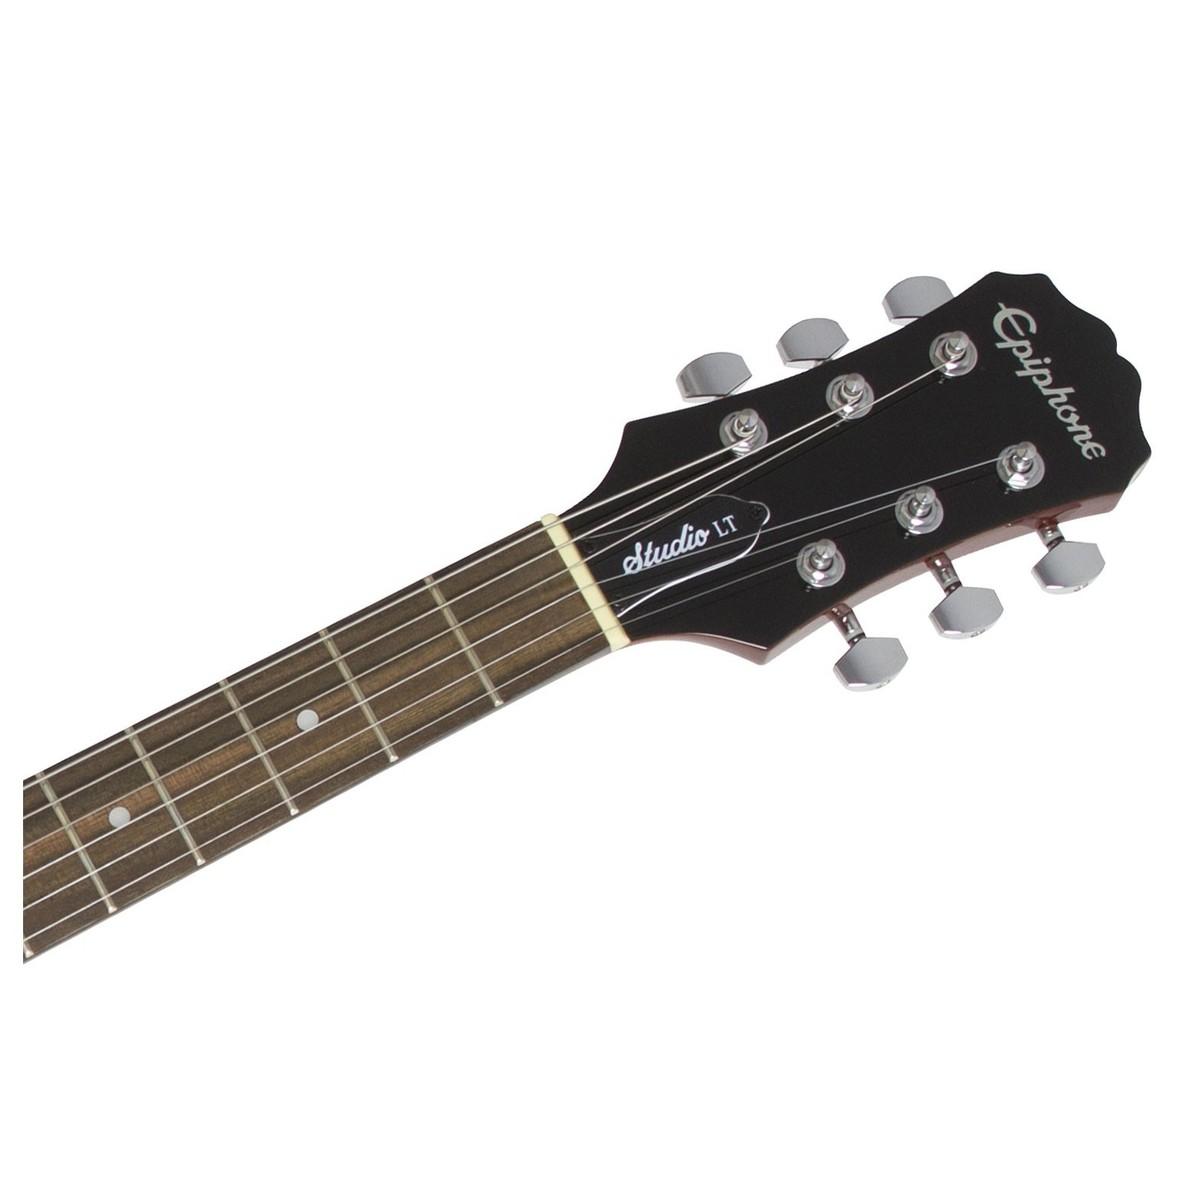 Epiphone Les Paul Studio Lt Walnut At Gear4music Single Humbucker Wiring Diagram 6 Jr Electric Guitar Neck Loading Zoom